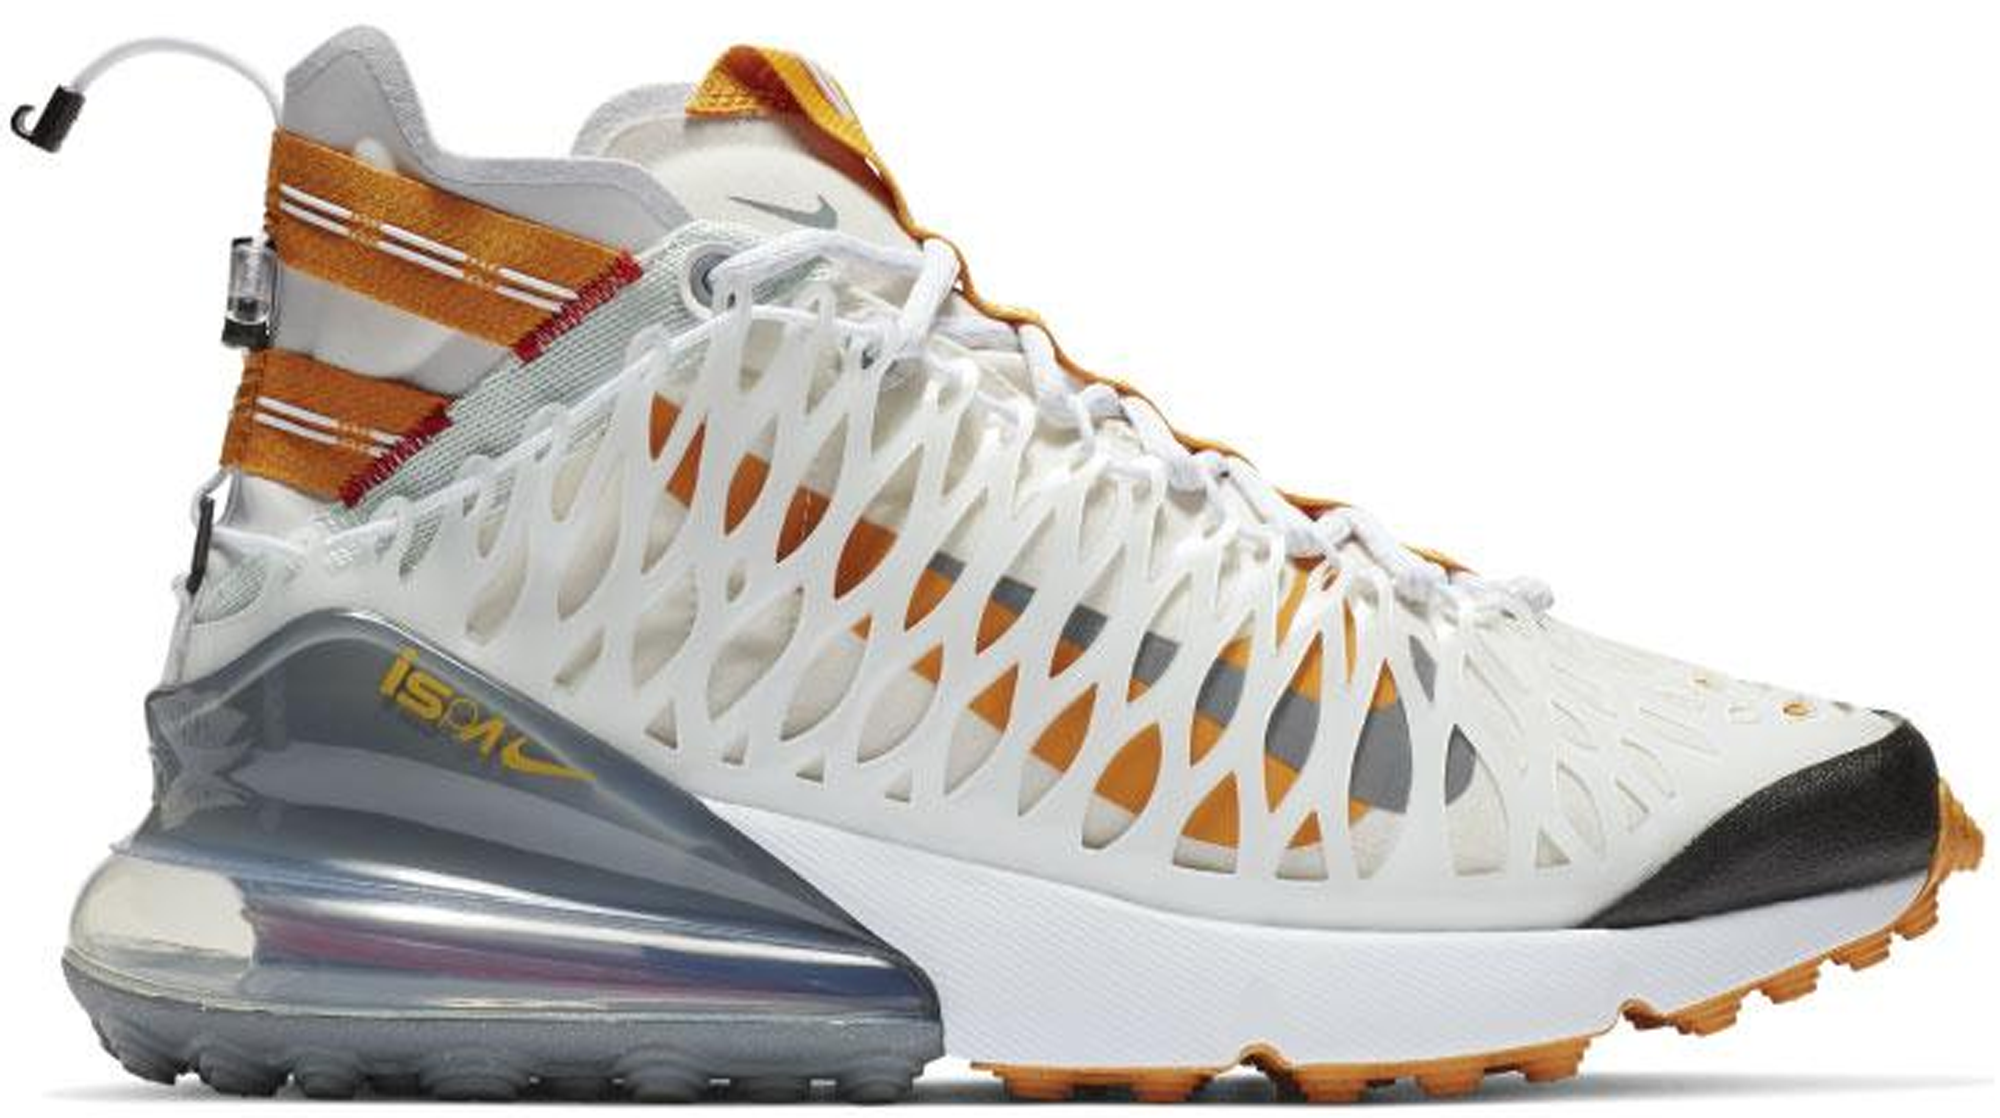 Nike Air Max 270 ISPA White Amber Rise